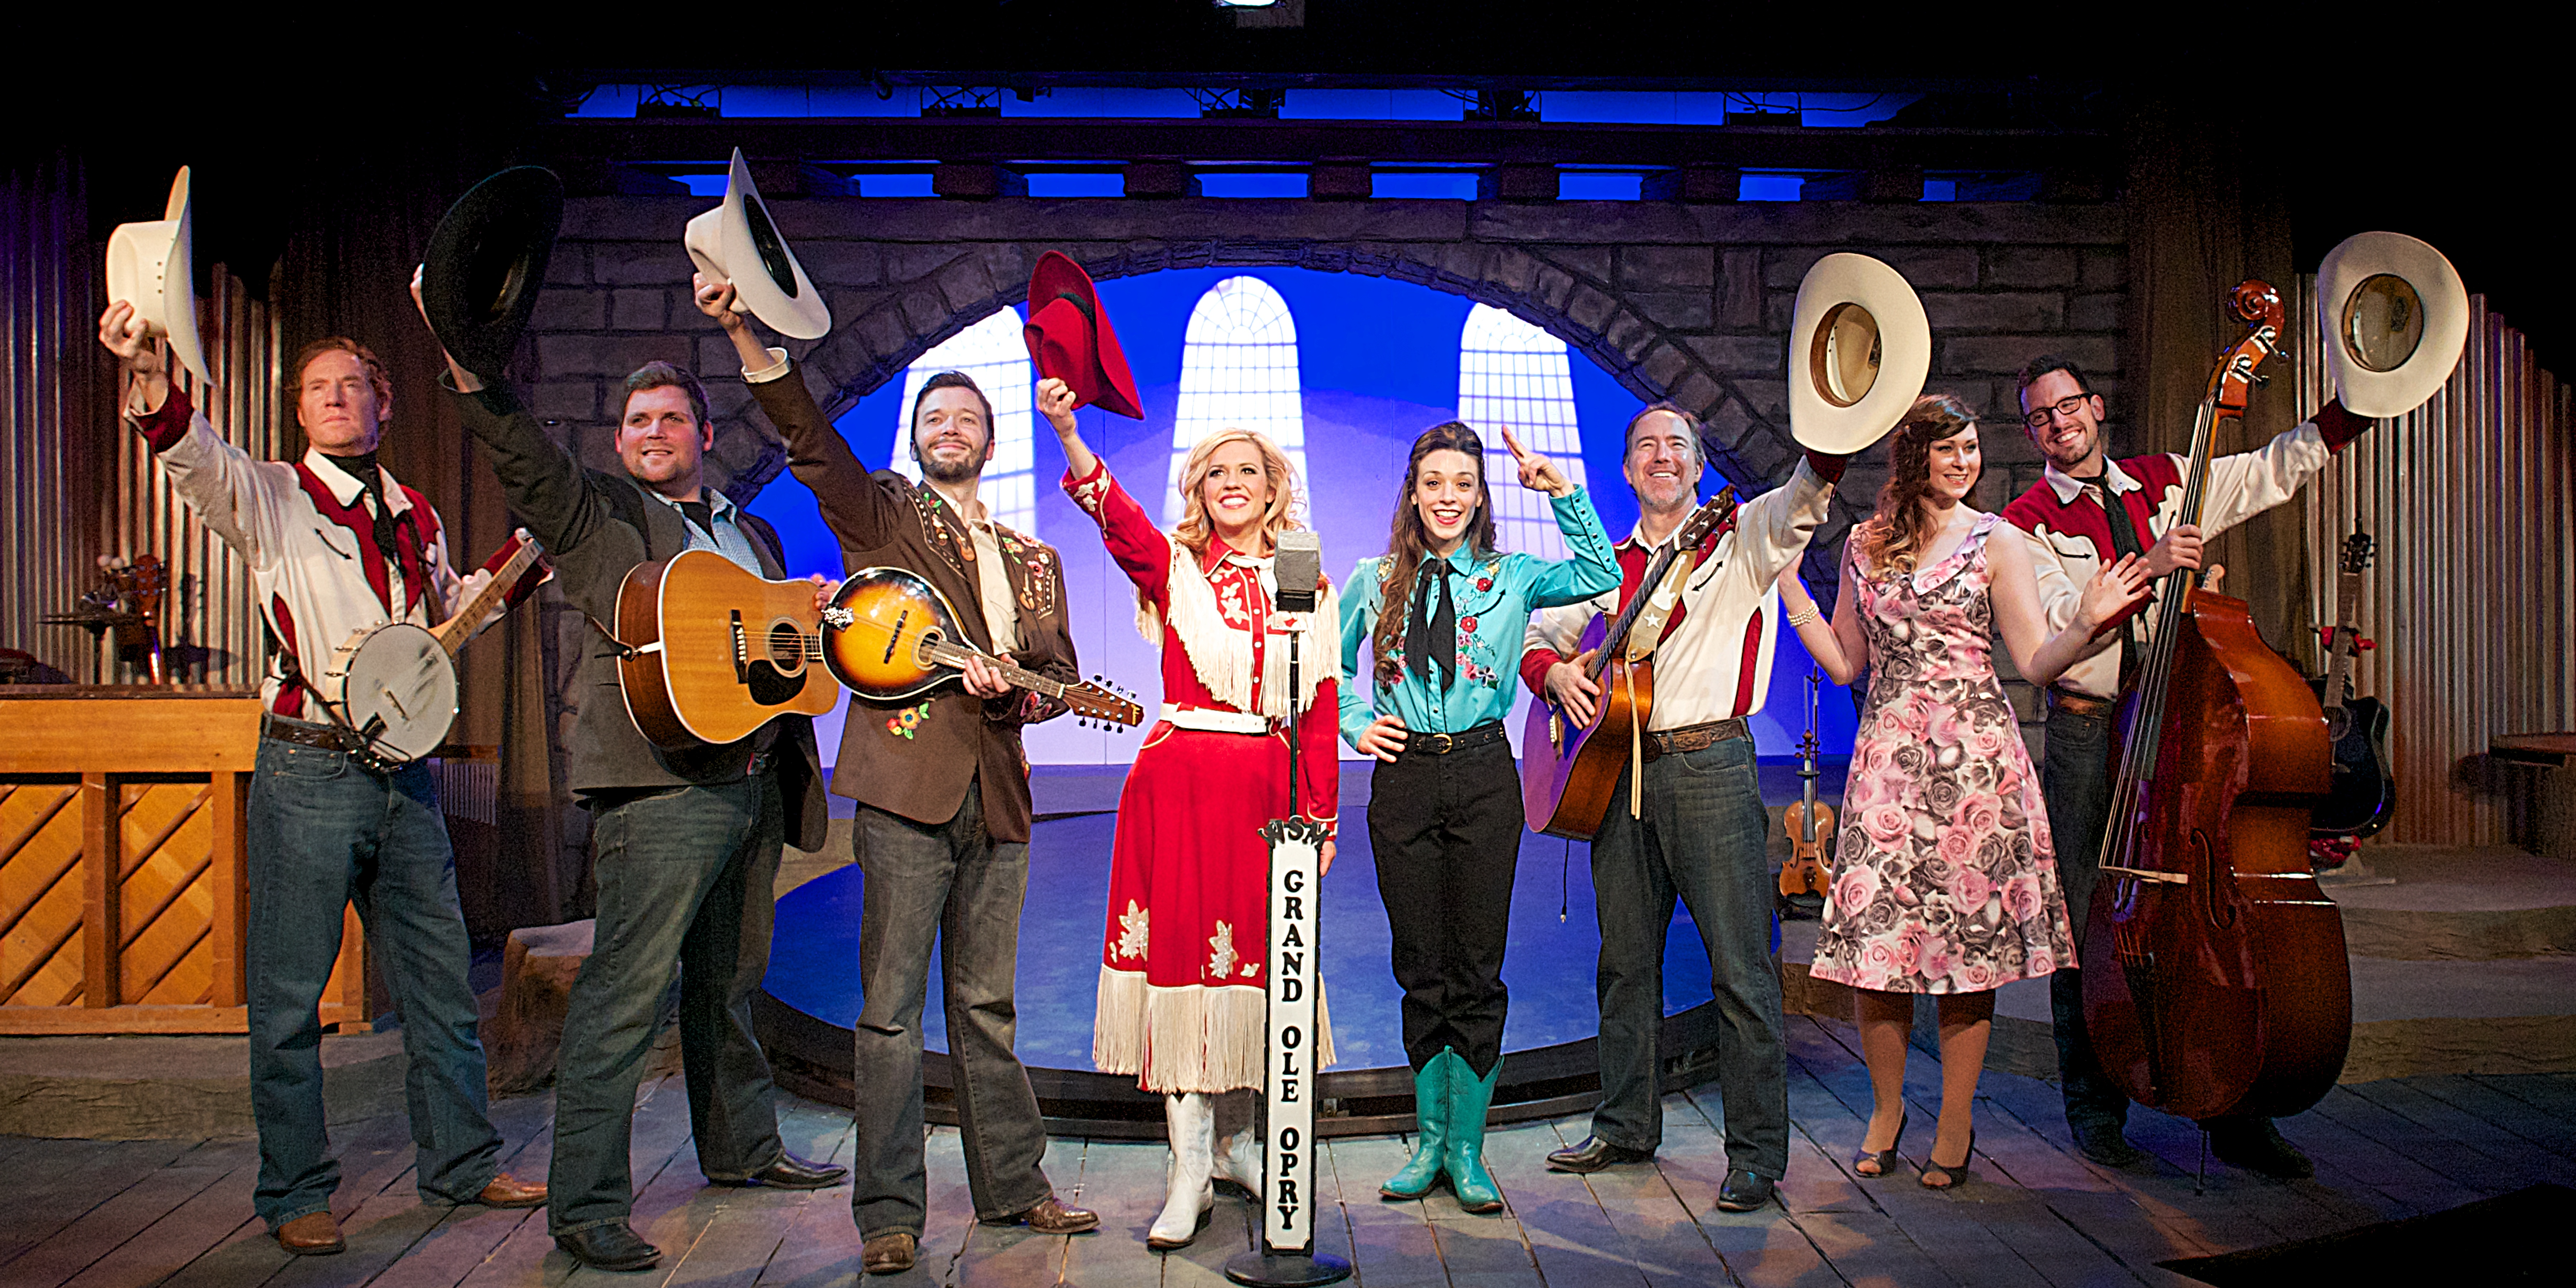 Photo courtesy Plymouth Playhouse